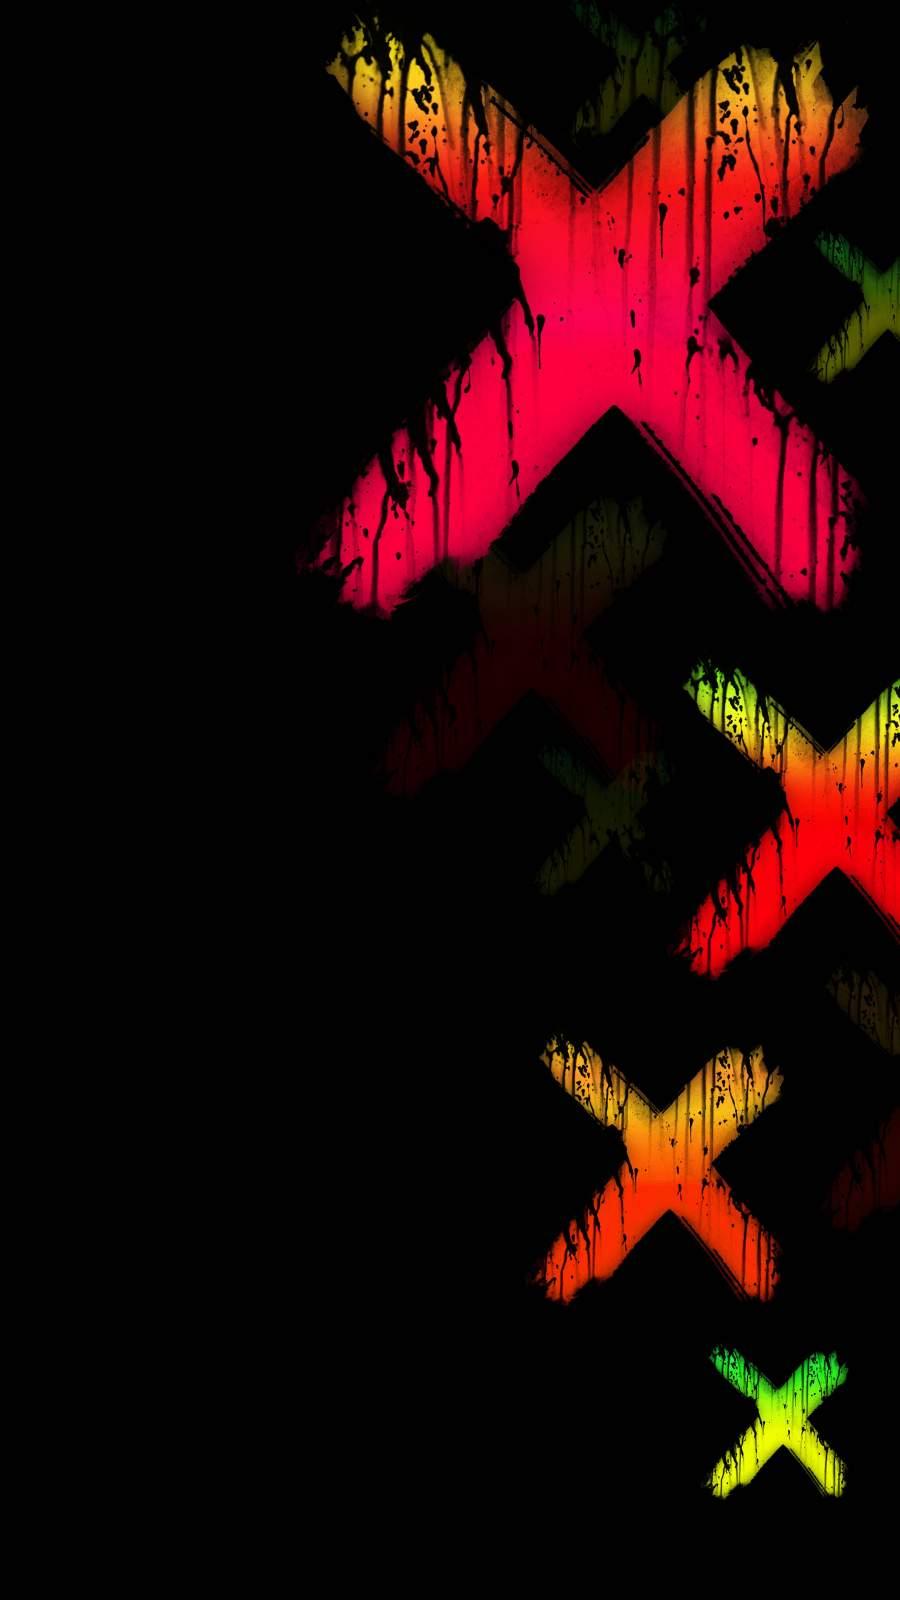 X Amoled iPhone Wallpaper